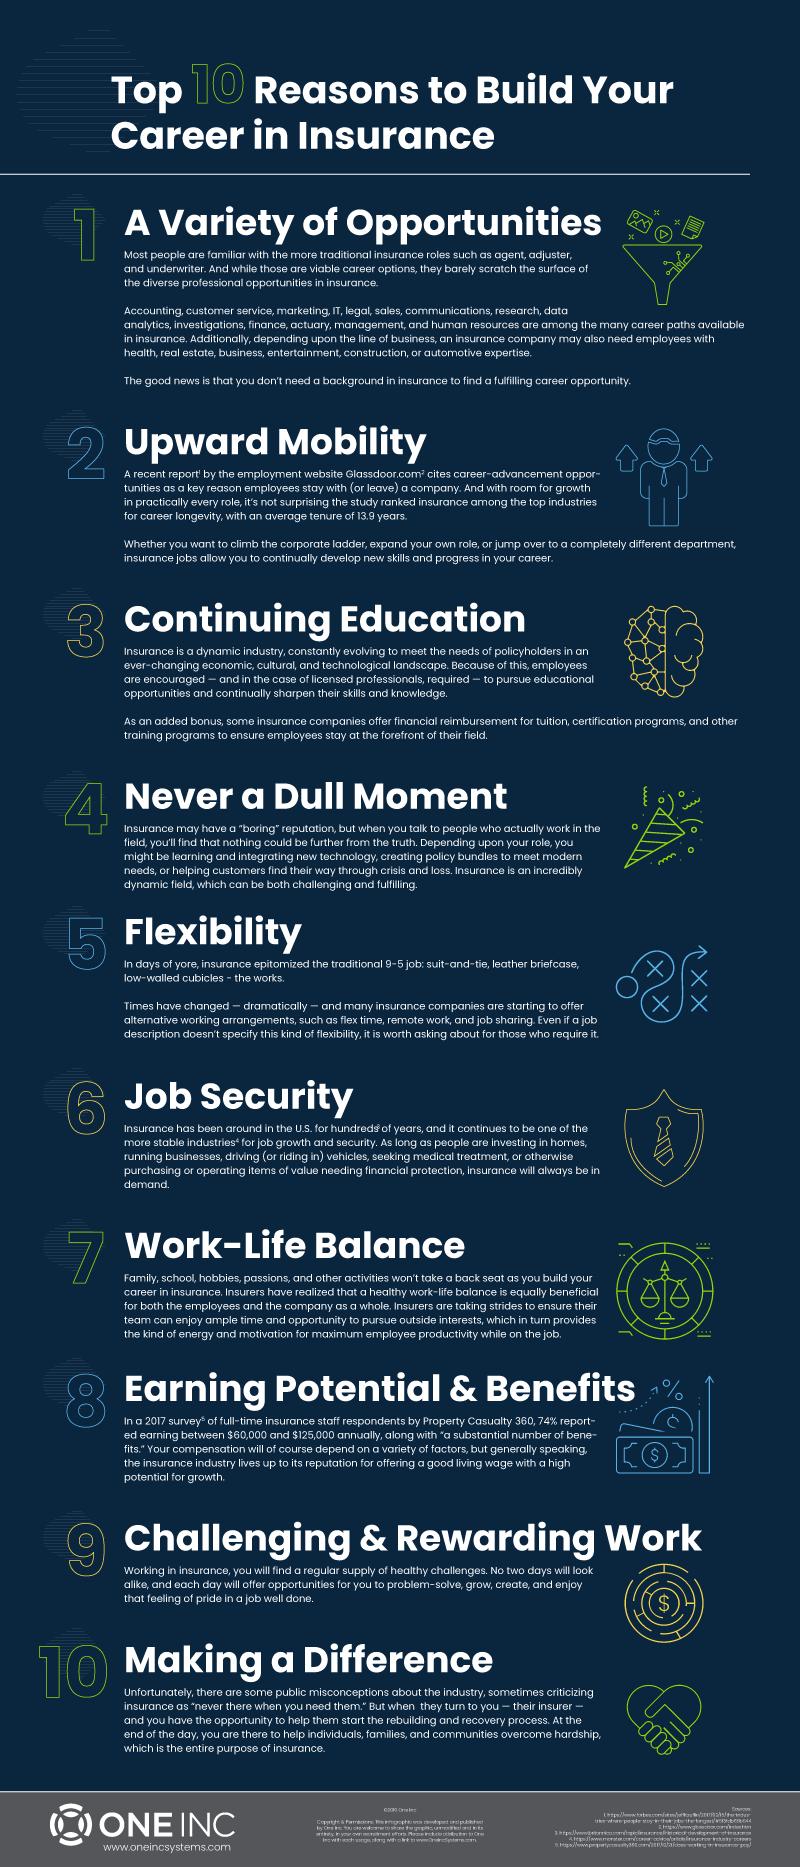 Top-10-Reasons-Work-in-Insurance